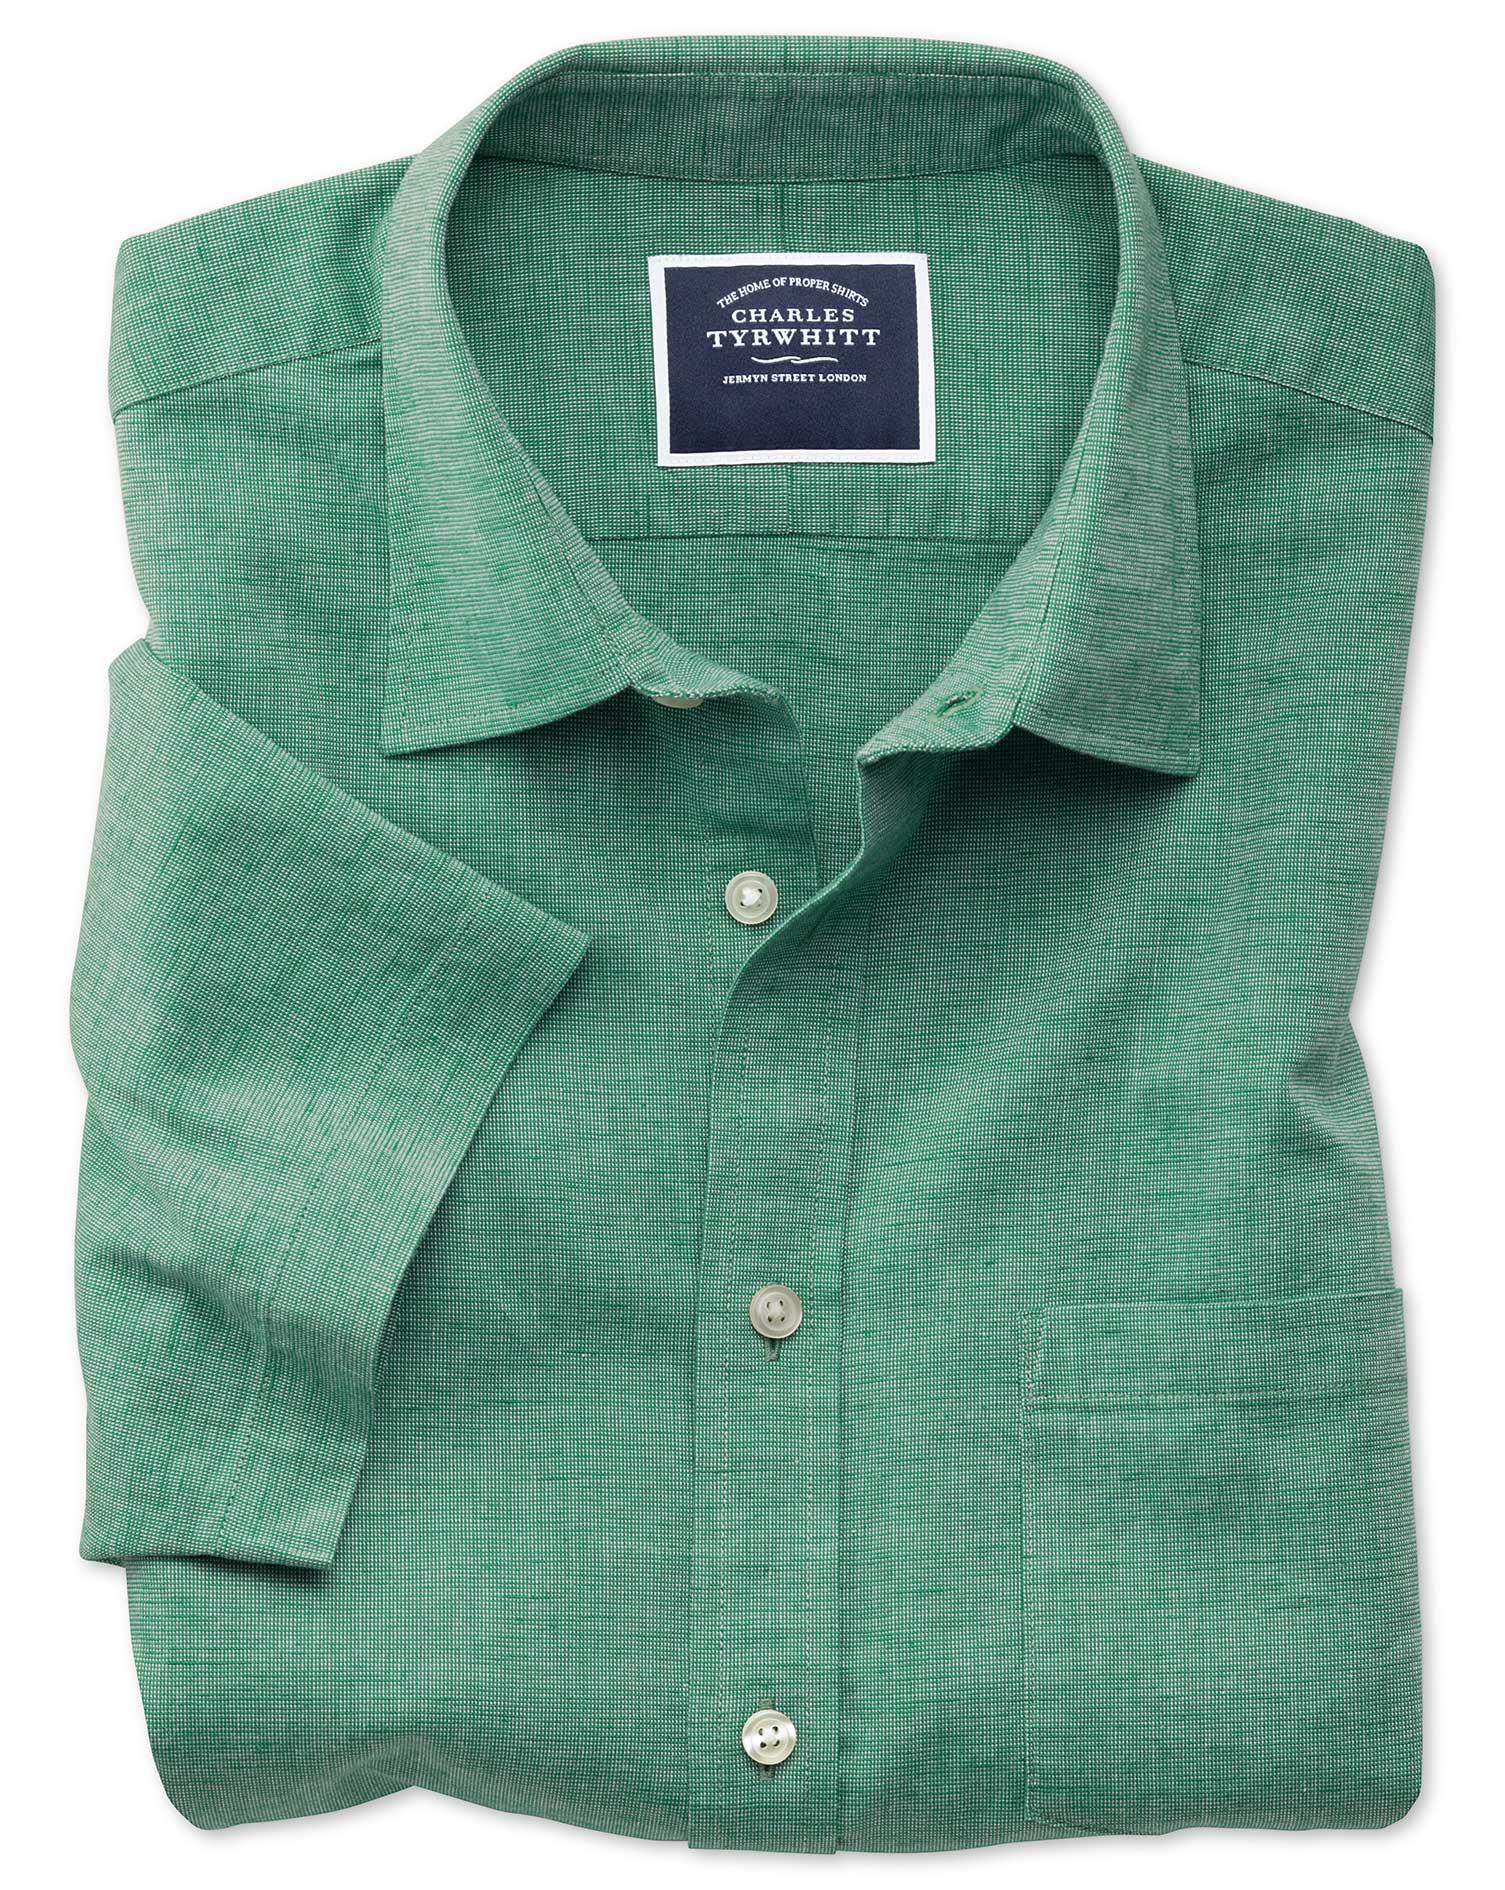 Slim Fit Cotton Linen Short Sleeve Green Plain Shirt Single Cuff Size XS by Charles Tyrwhitt